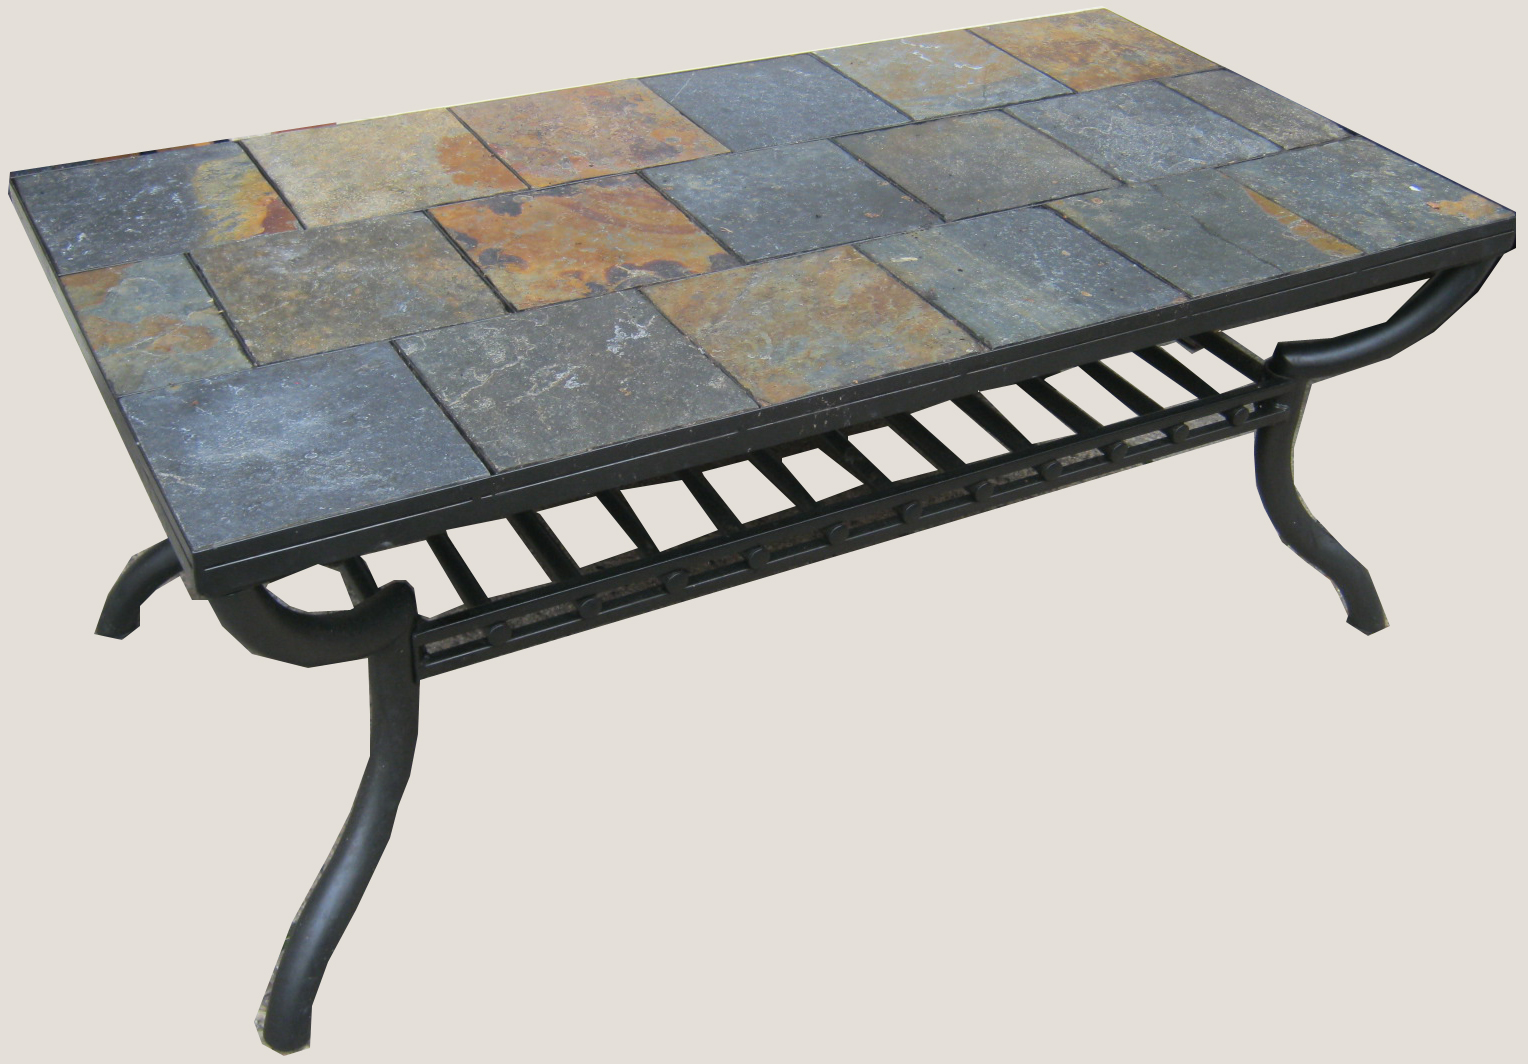 Uhuru Furniture & Collectibles: Slate Tile Coffee Table SOLD